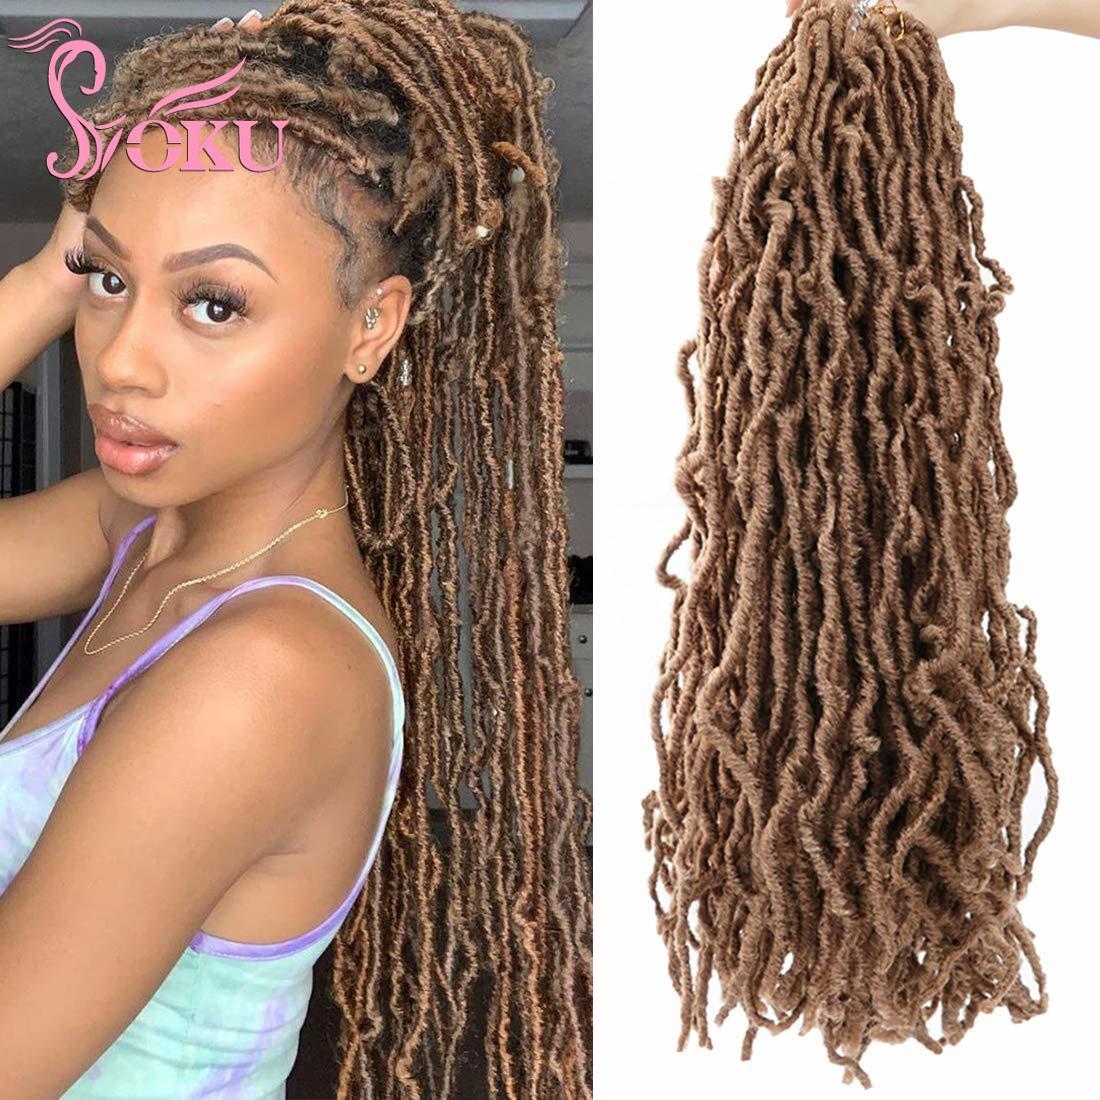 AliExpress - New Curly Faux Locs Crochet Braid Hair Synthetic Braids Pre Looped Braiding Hair Extensions SOKU Soft Wavy Small Dreadlocks